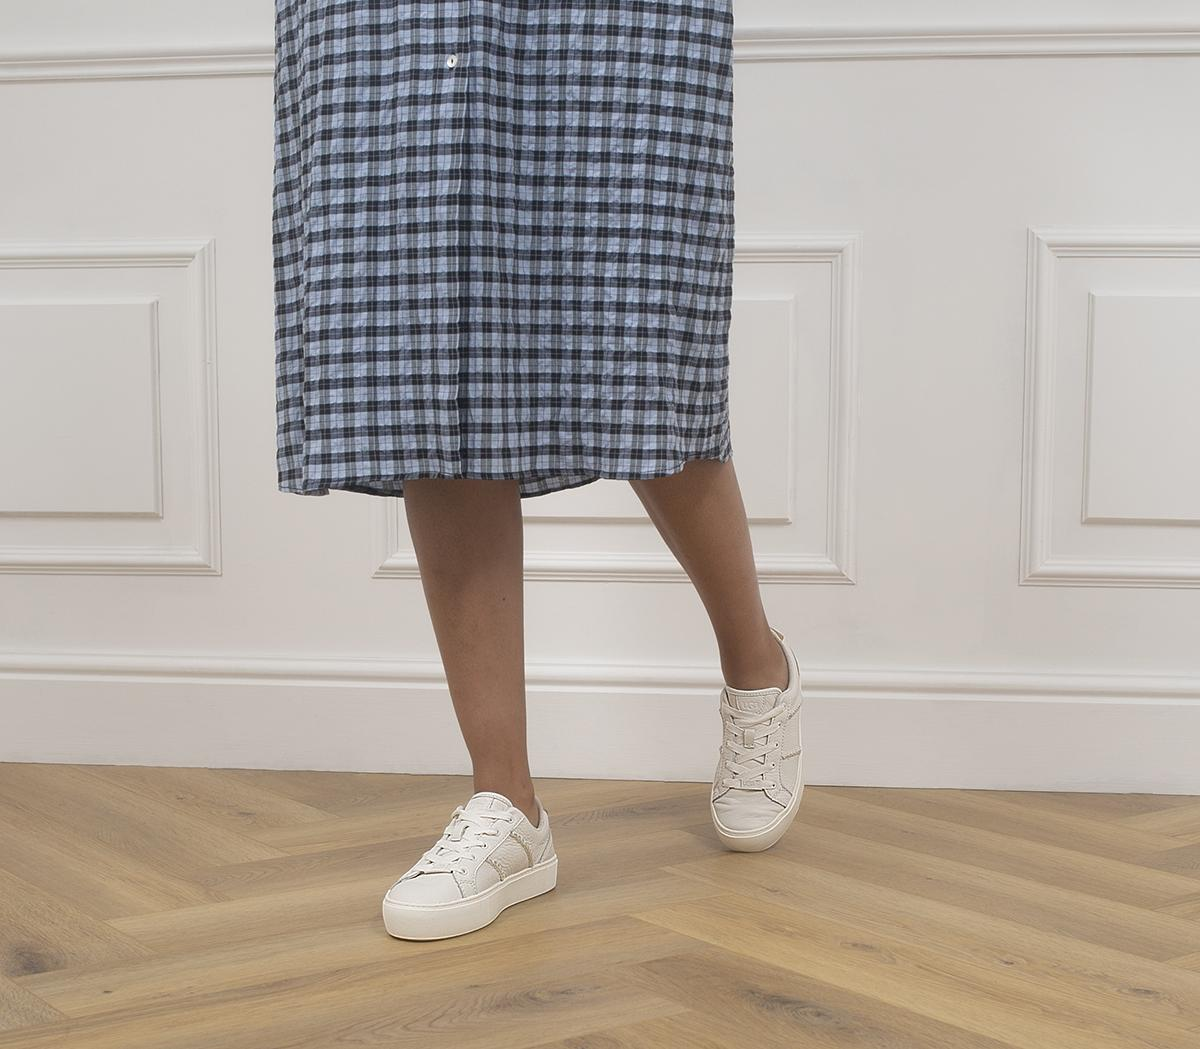 Dinale Sneakers